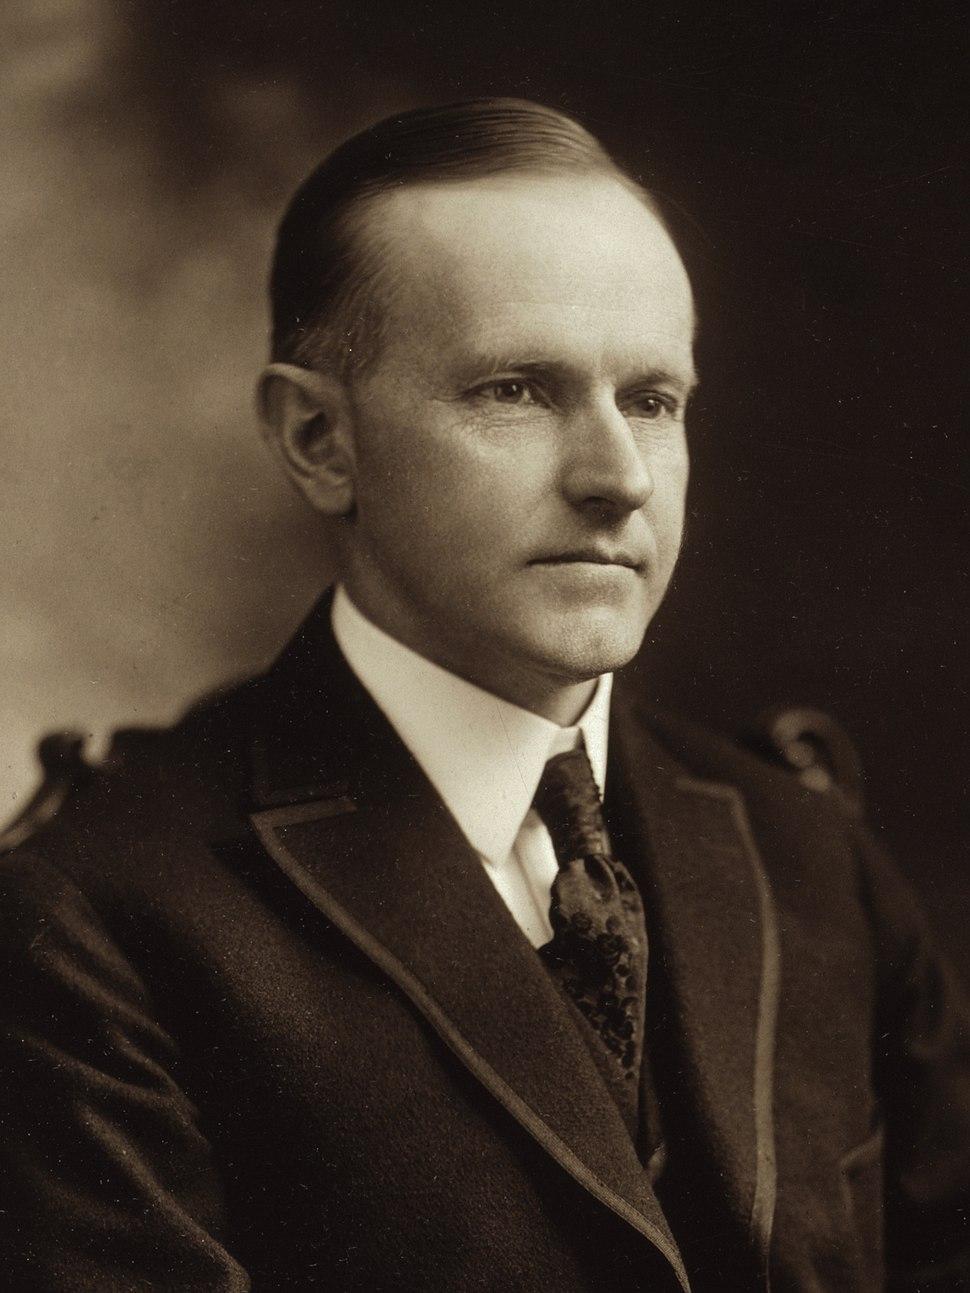 Calvin Coolidge cph.3g10777 (cropped)